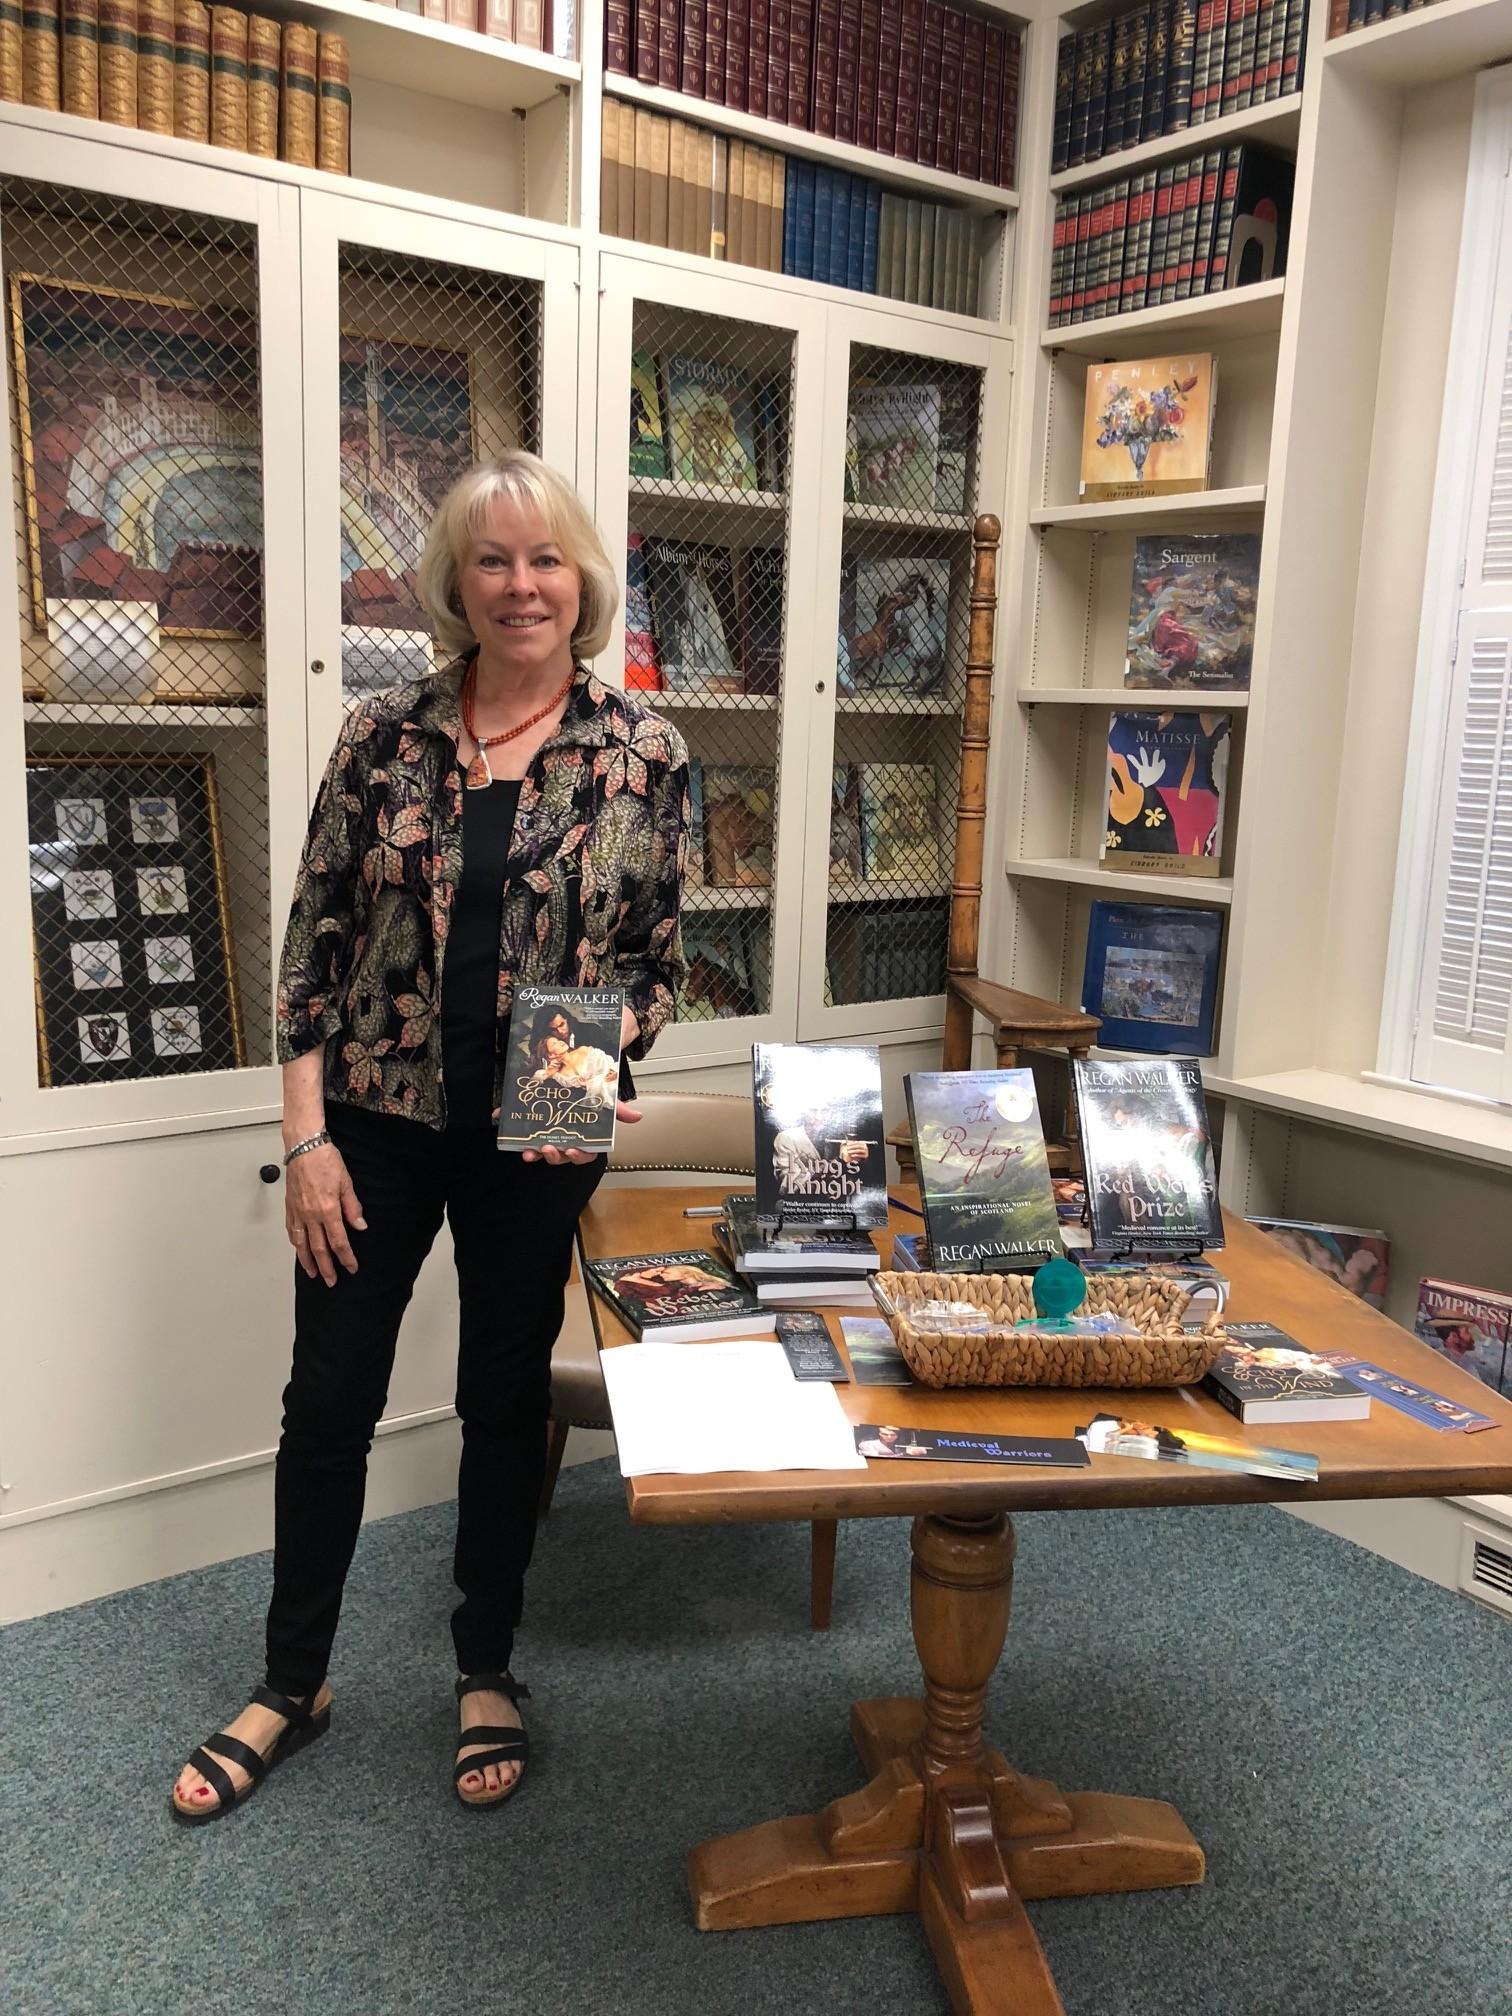 Historical-romance novelist stickler for details, authenticity